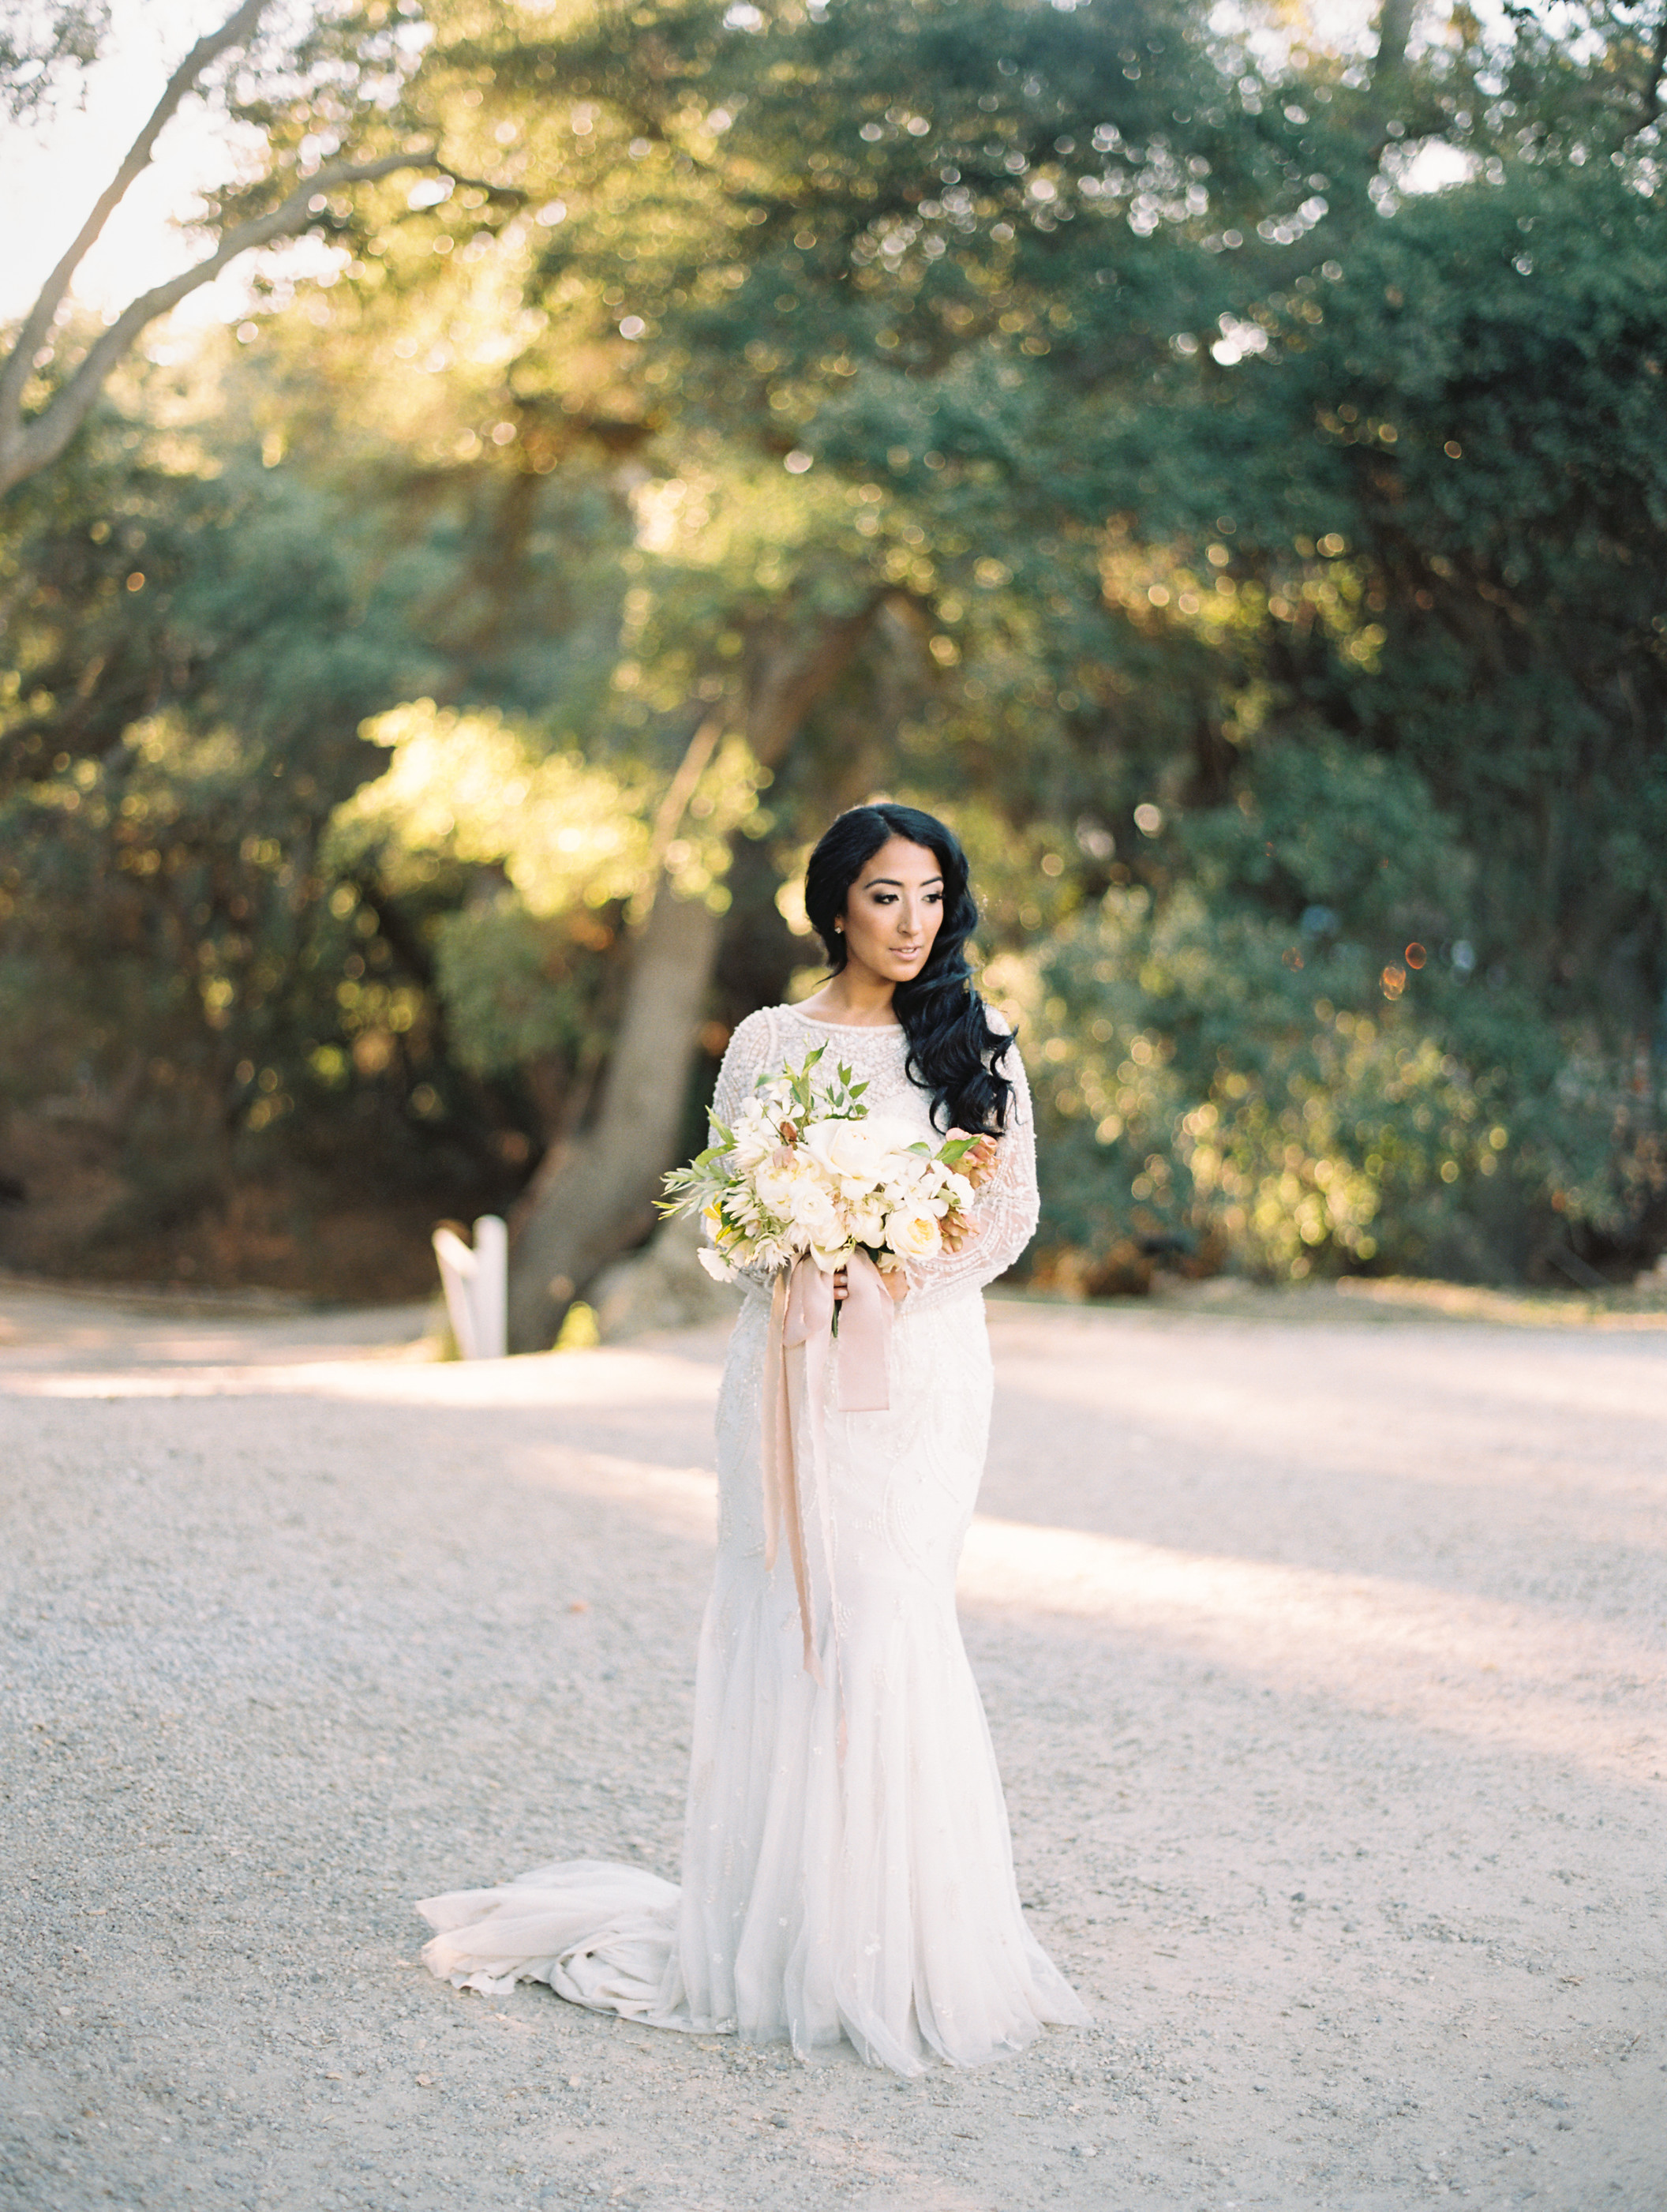 554-fine-art-film-kristopher-veronica-malibu-wedding-brumley-wells-2112x2802.jpg